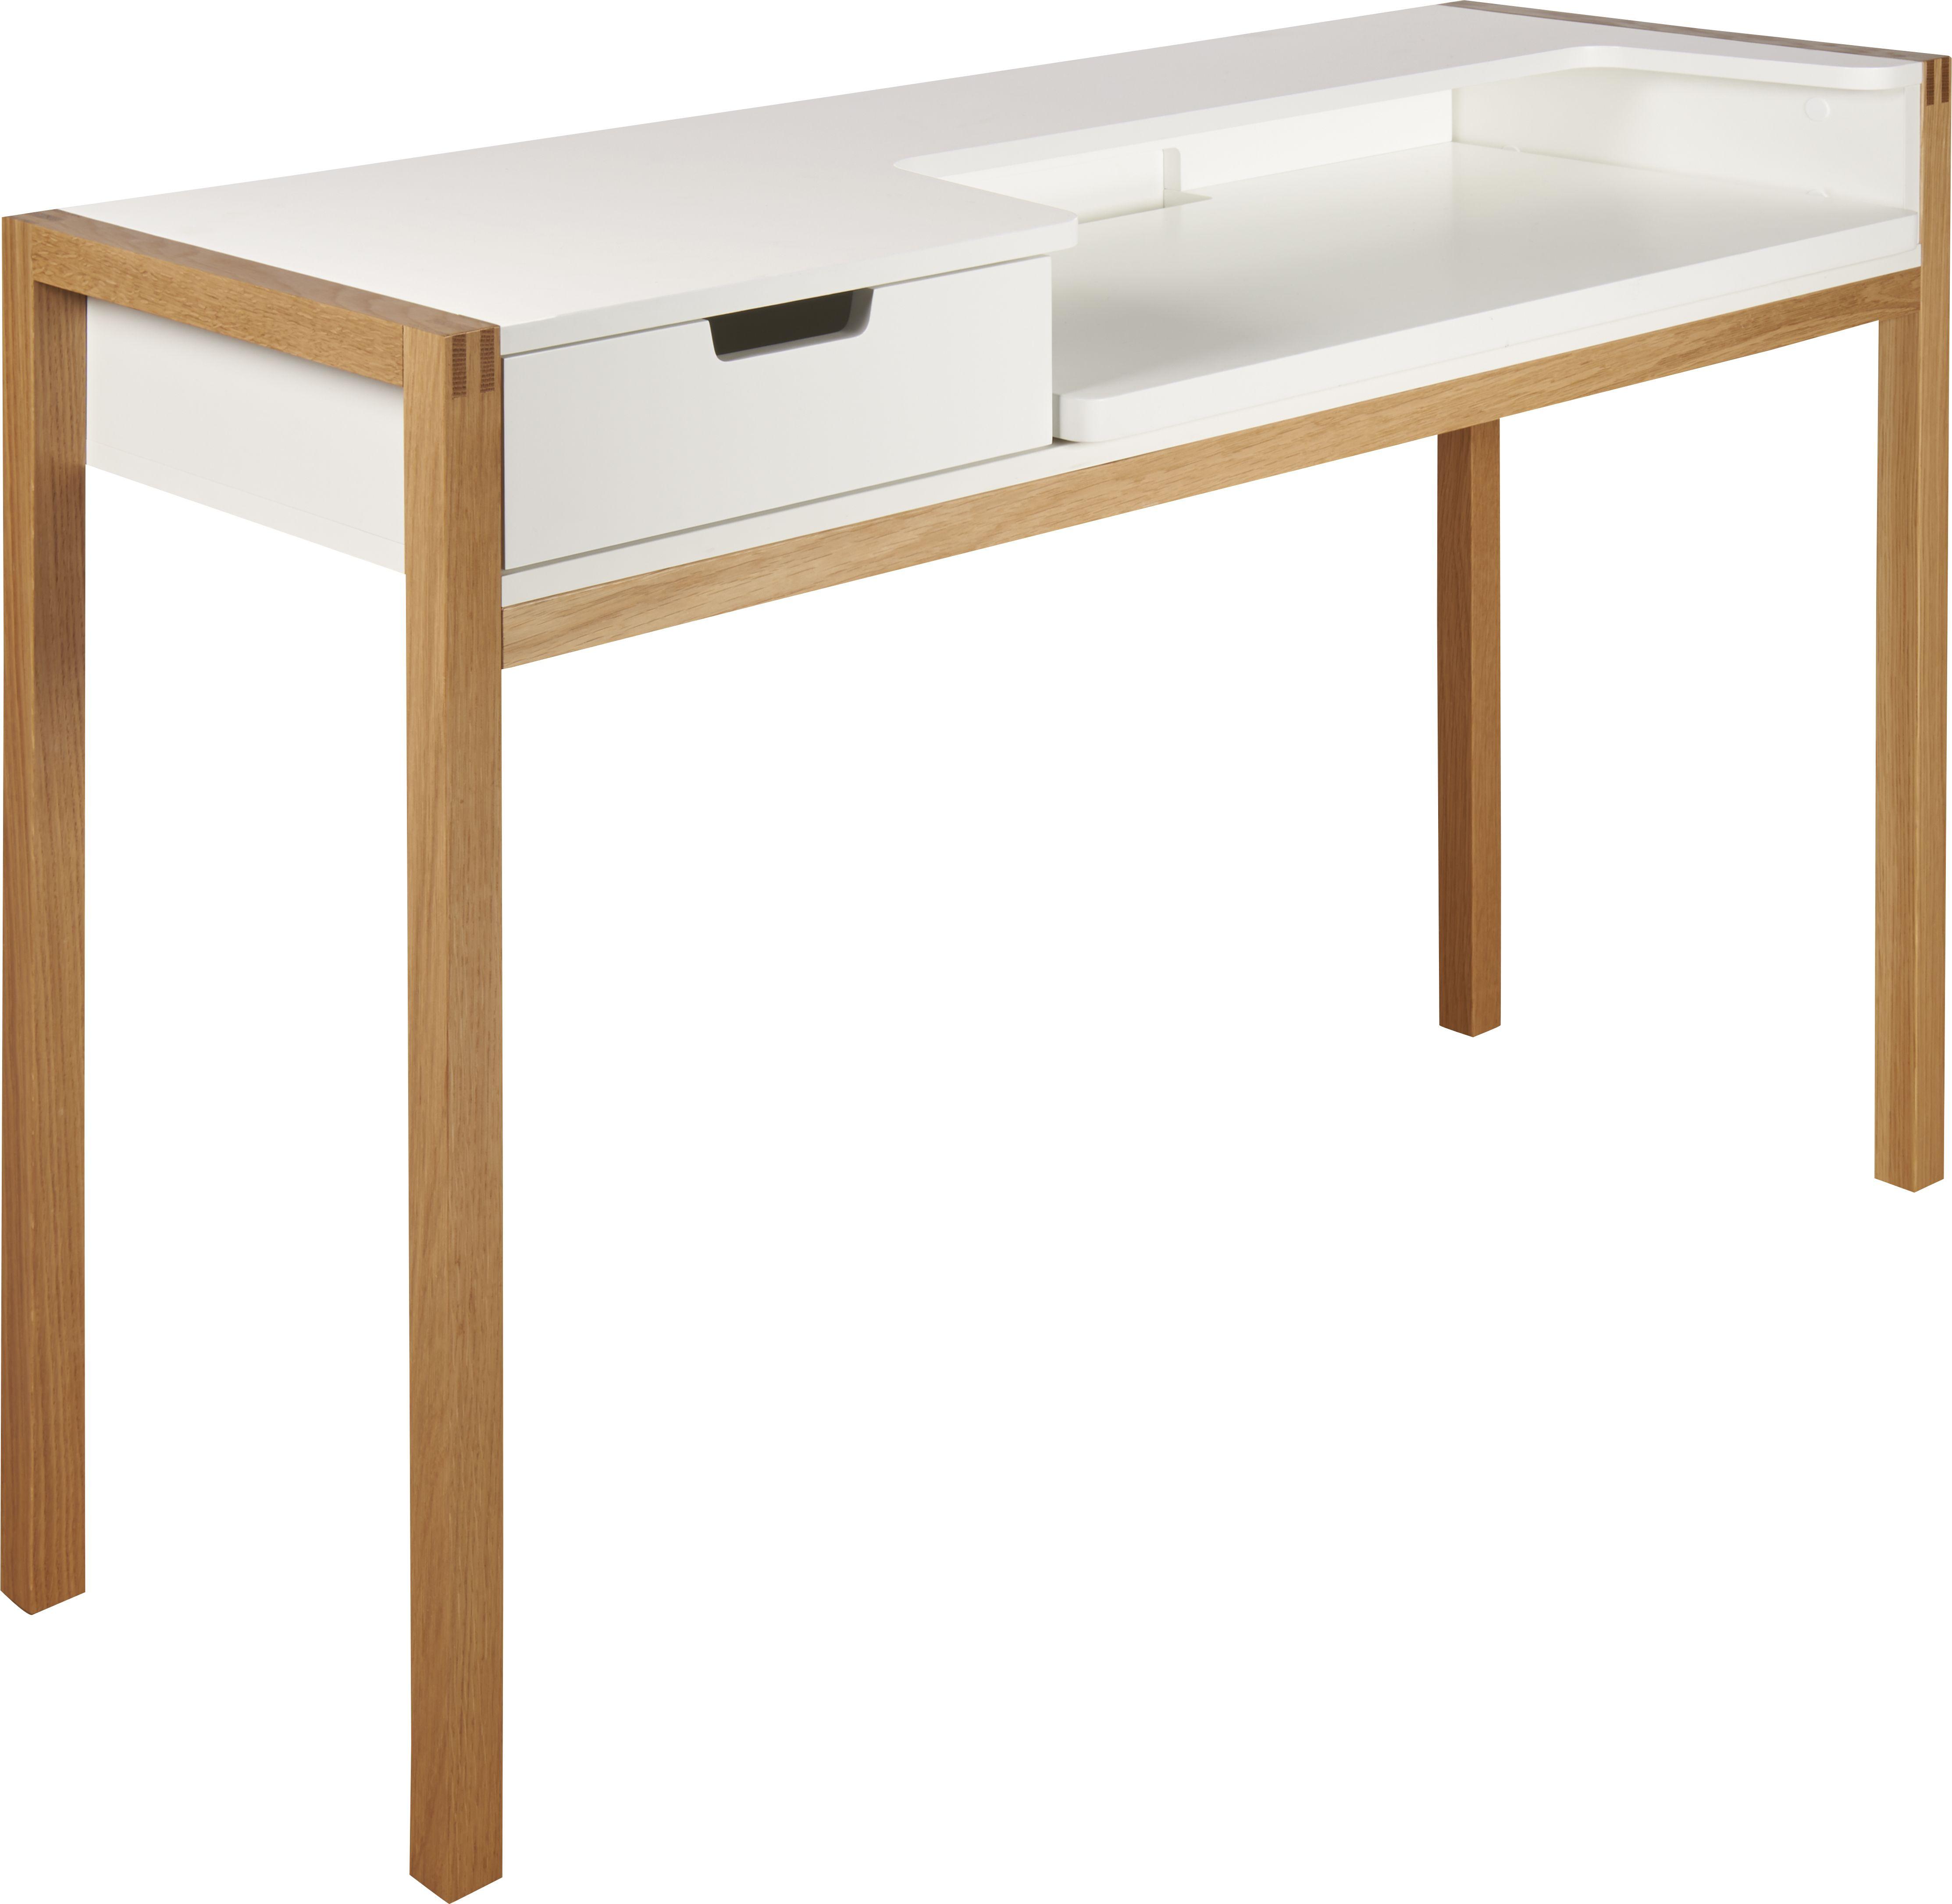 eade39e02f9f6ed2c5929e9faf94ed7d Luxe De Pied De Table Basse Ikea Schème